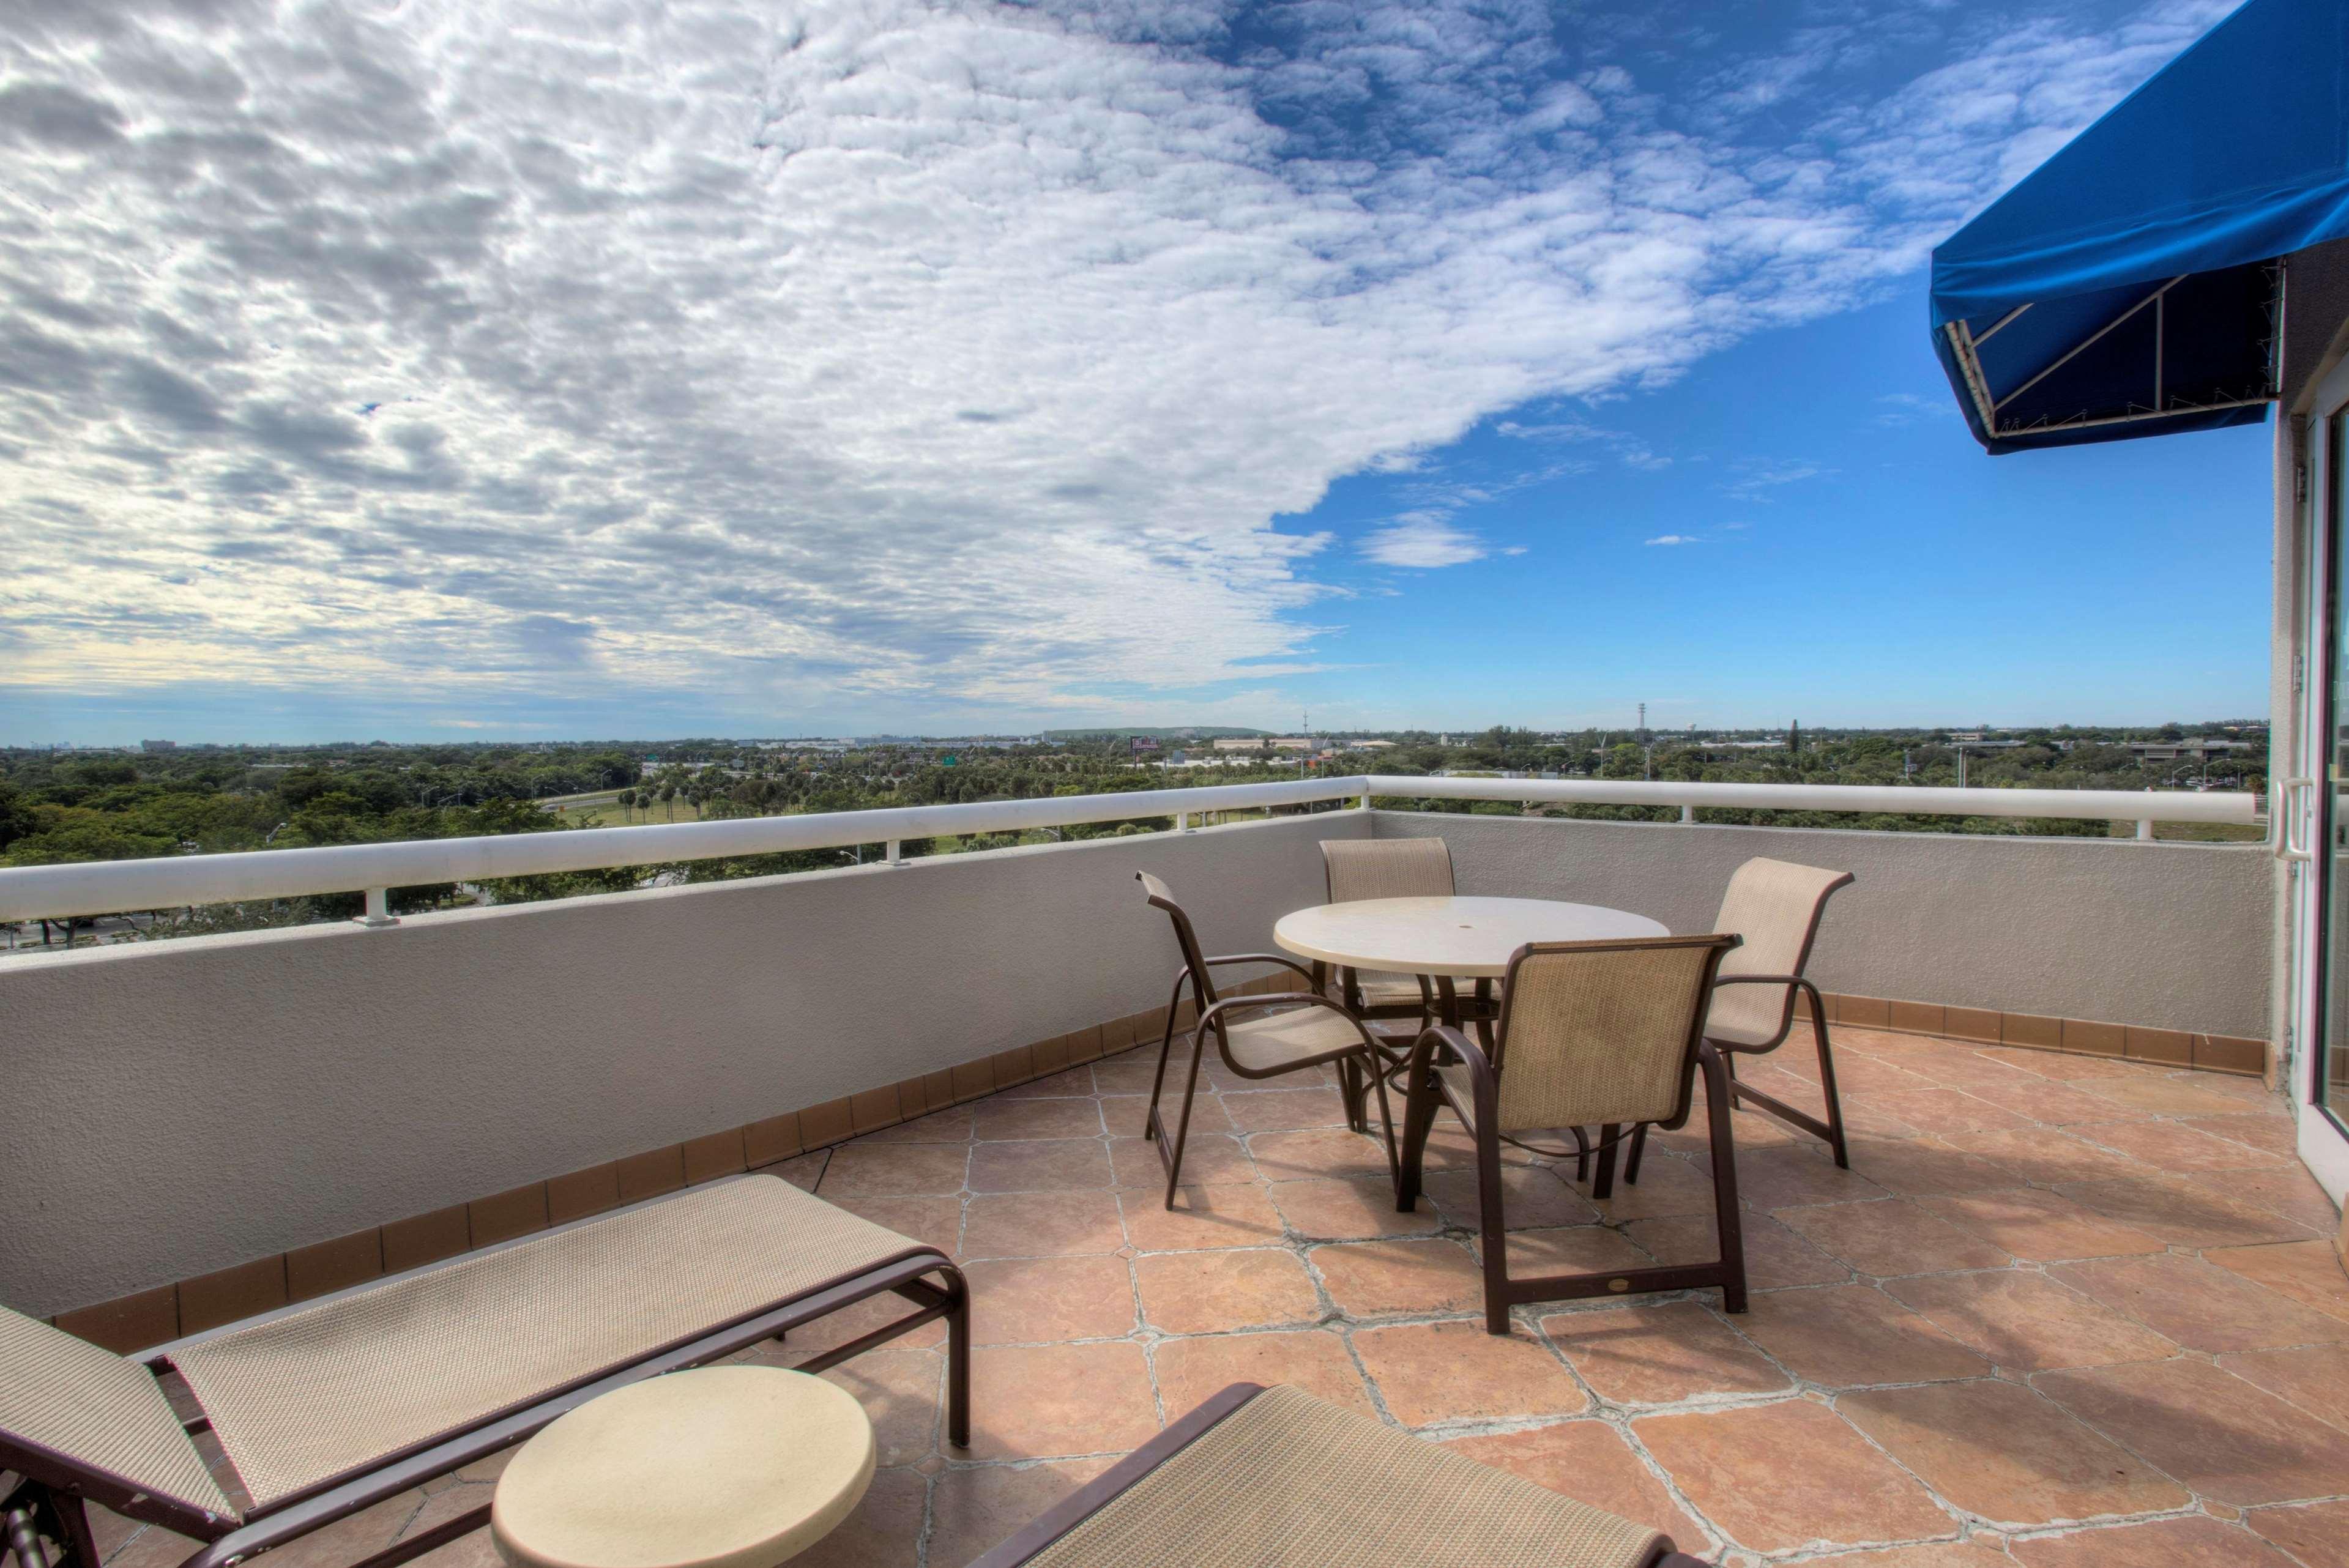 Doubletree By Hilton Hotel Deerfield Beach Boca Raton Reviews